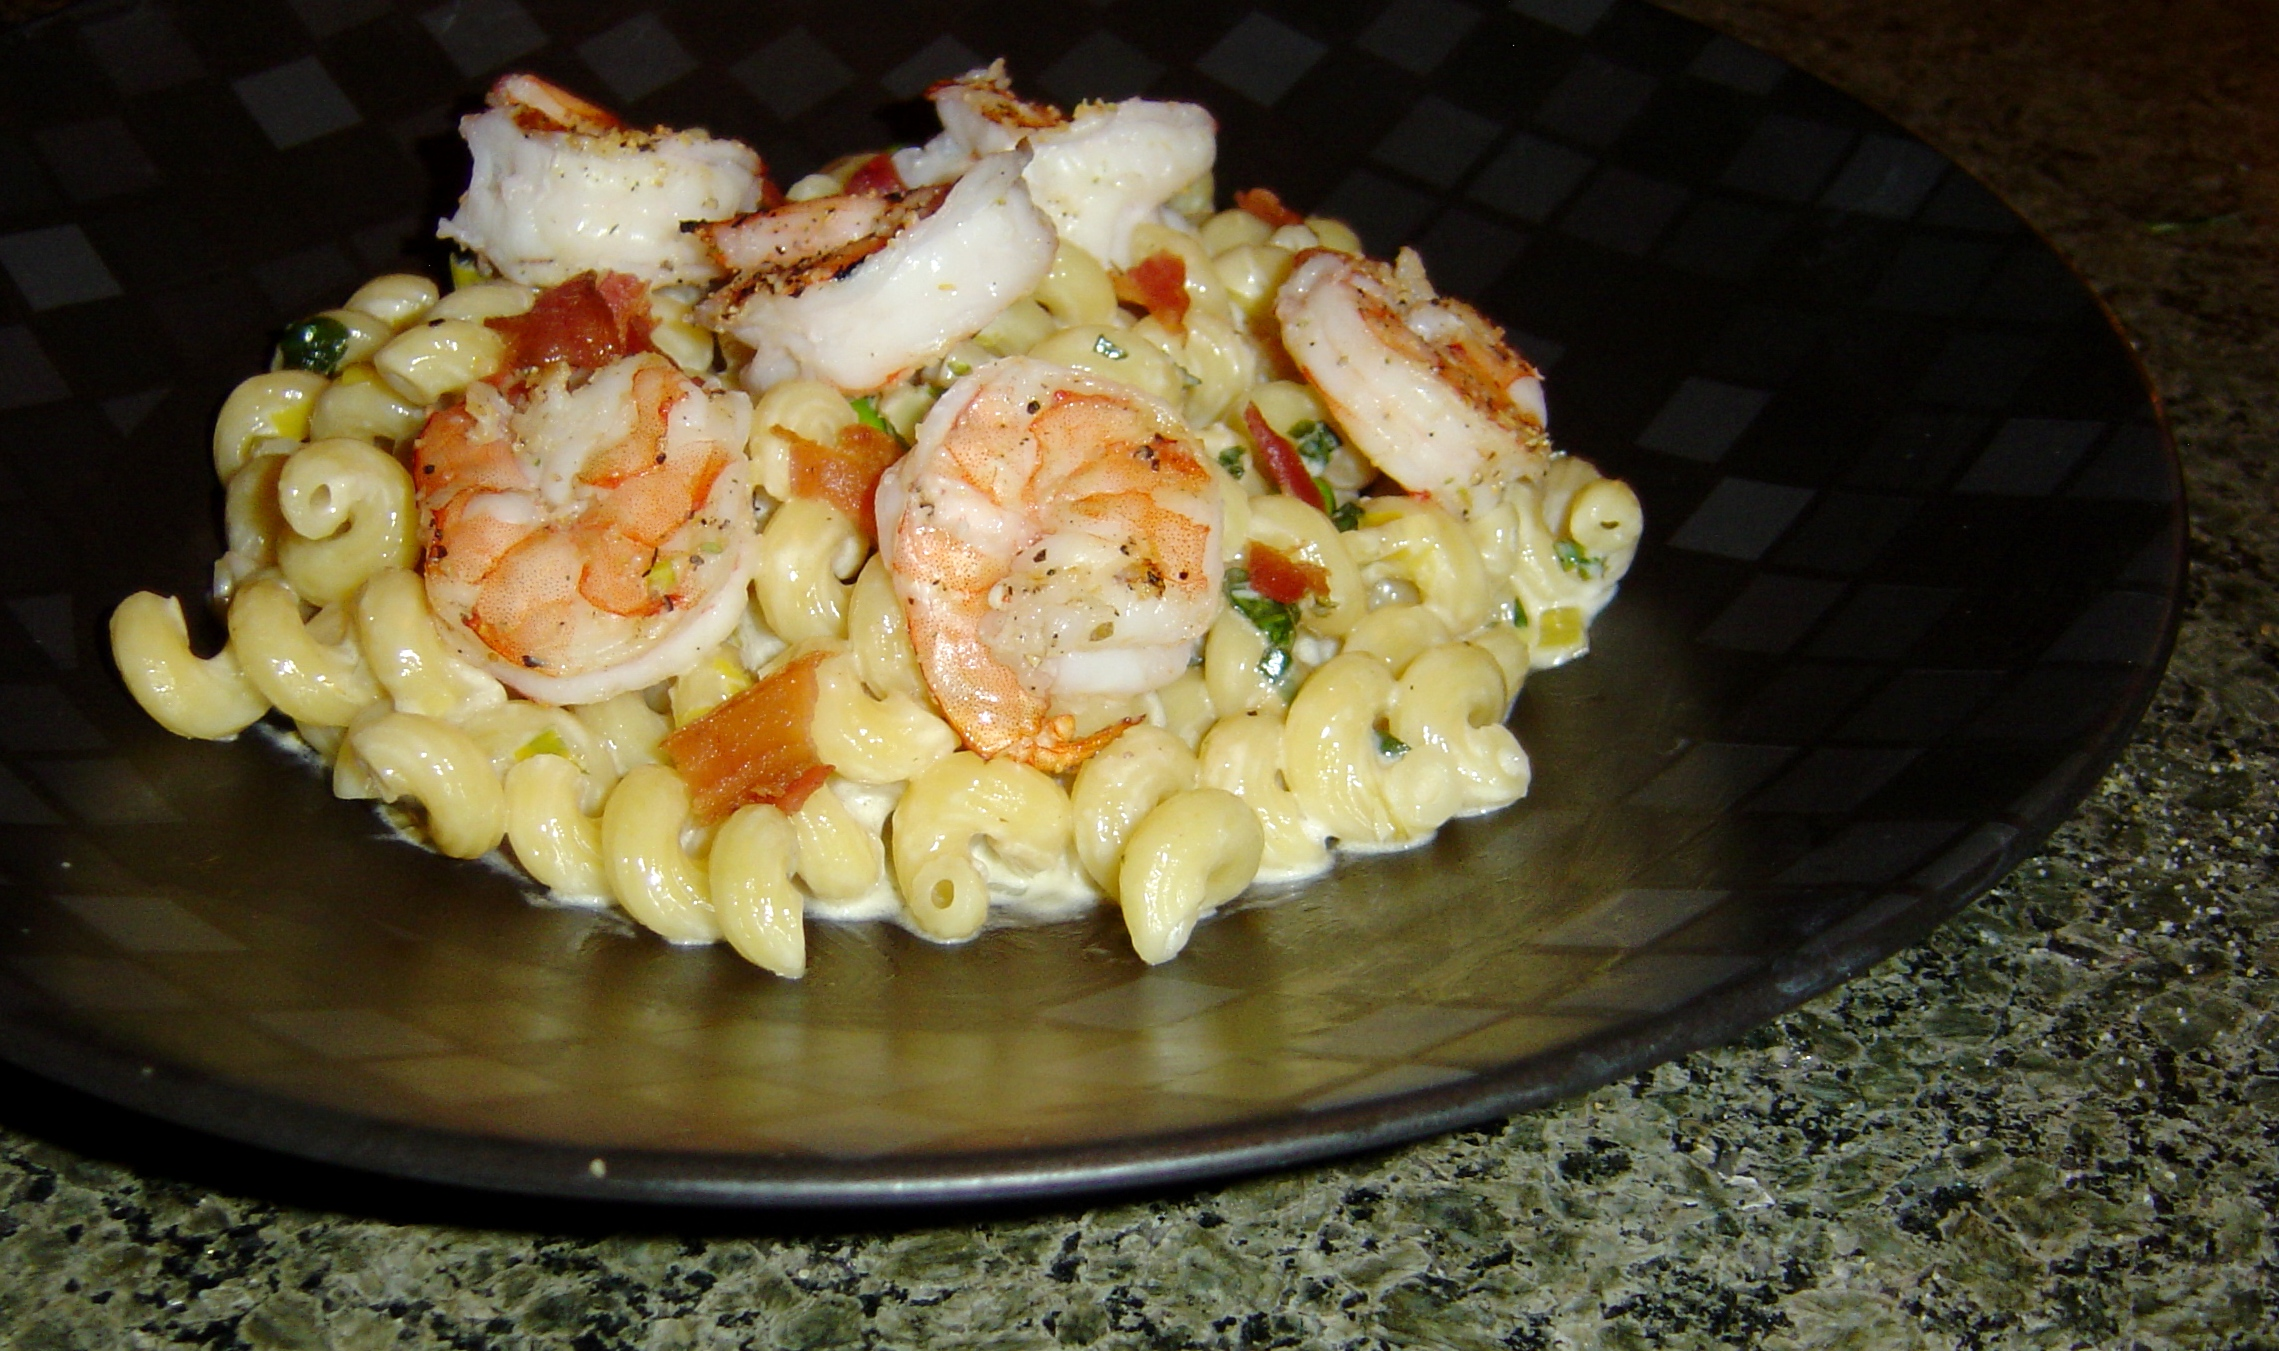 Lemon, Leek, and Basil Sauce (for seafood, chicken, or pasta)